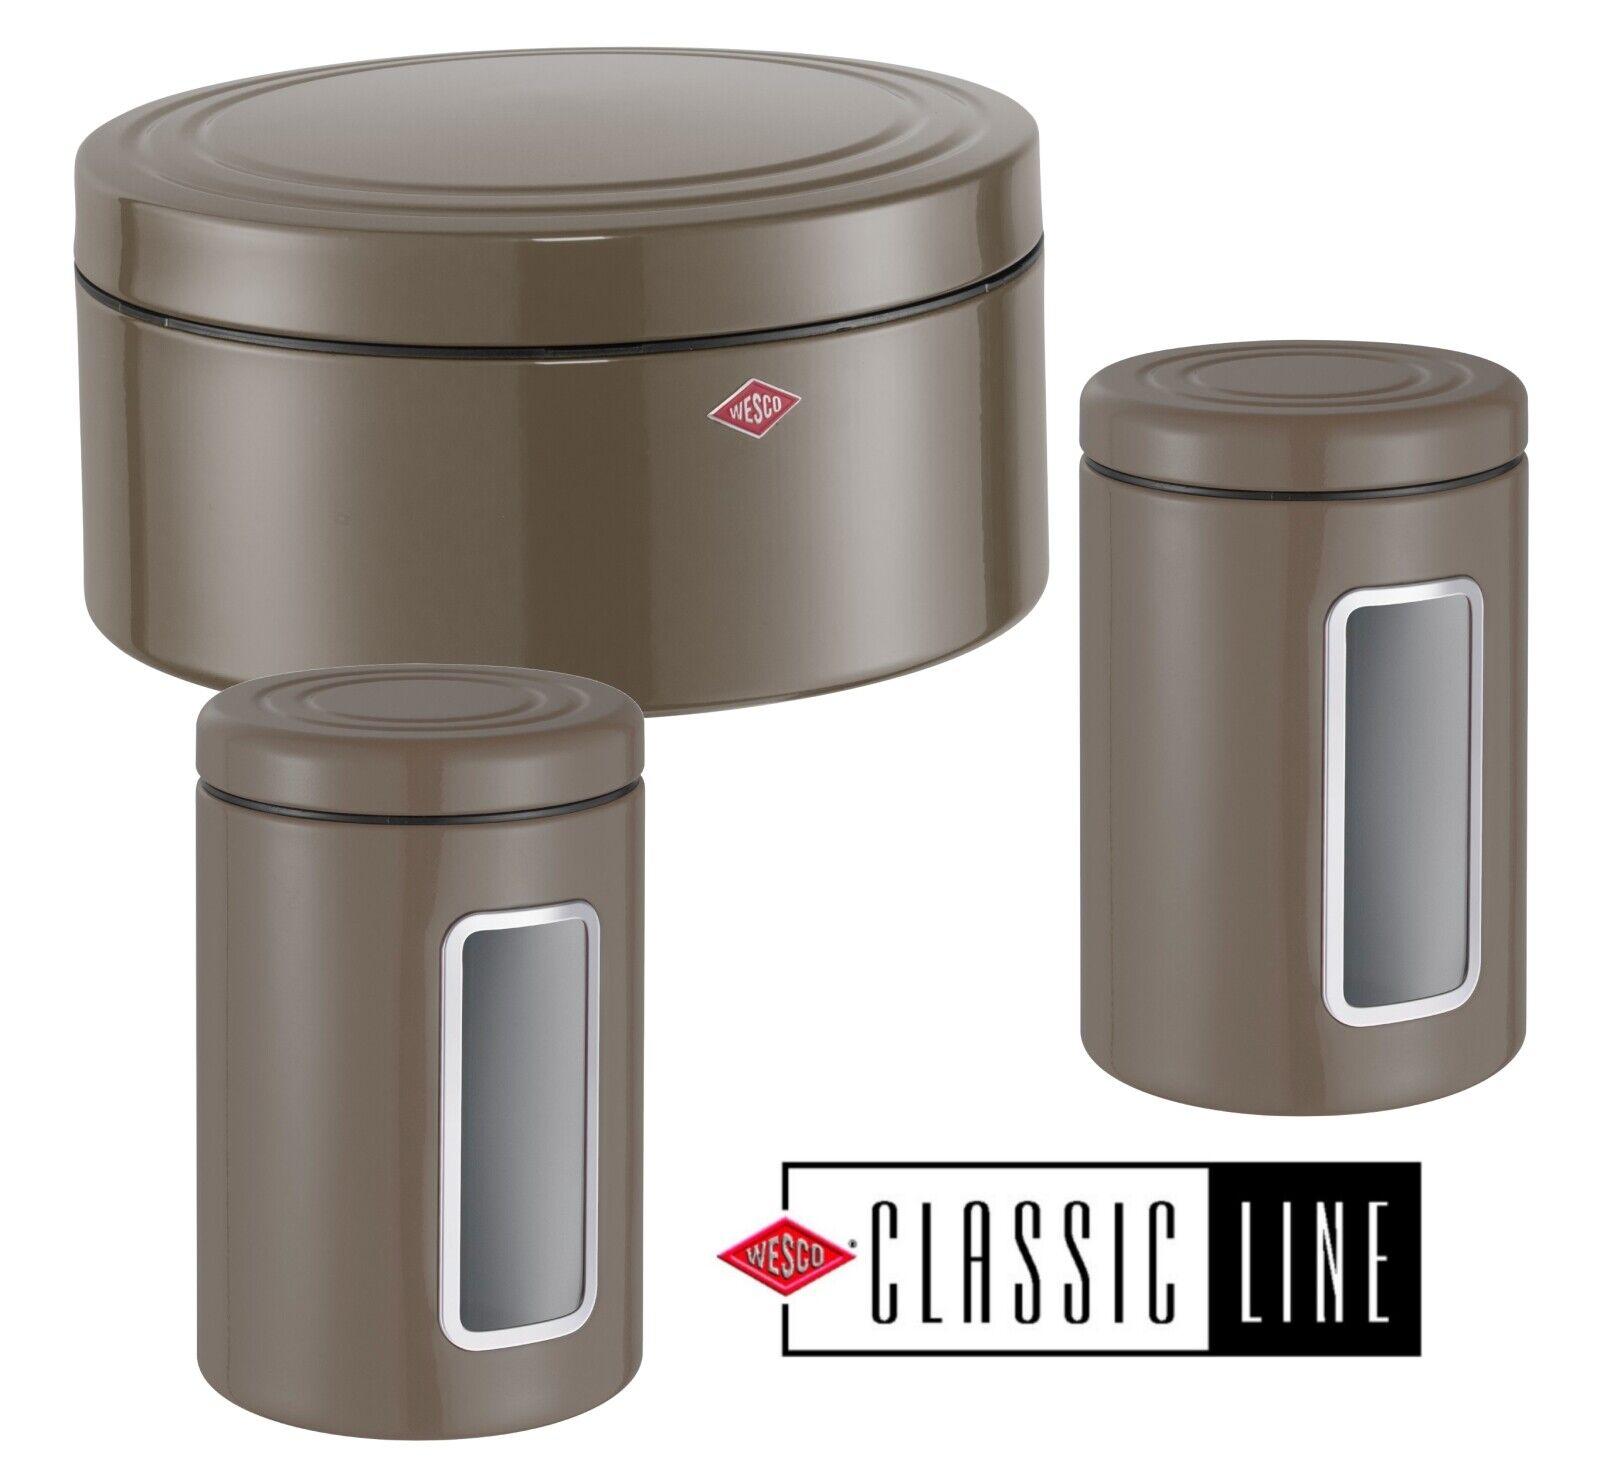 Wesco Classic Boite Dosette de Patisserie en Jeu + 2x Dose Inventaire à Gateaux